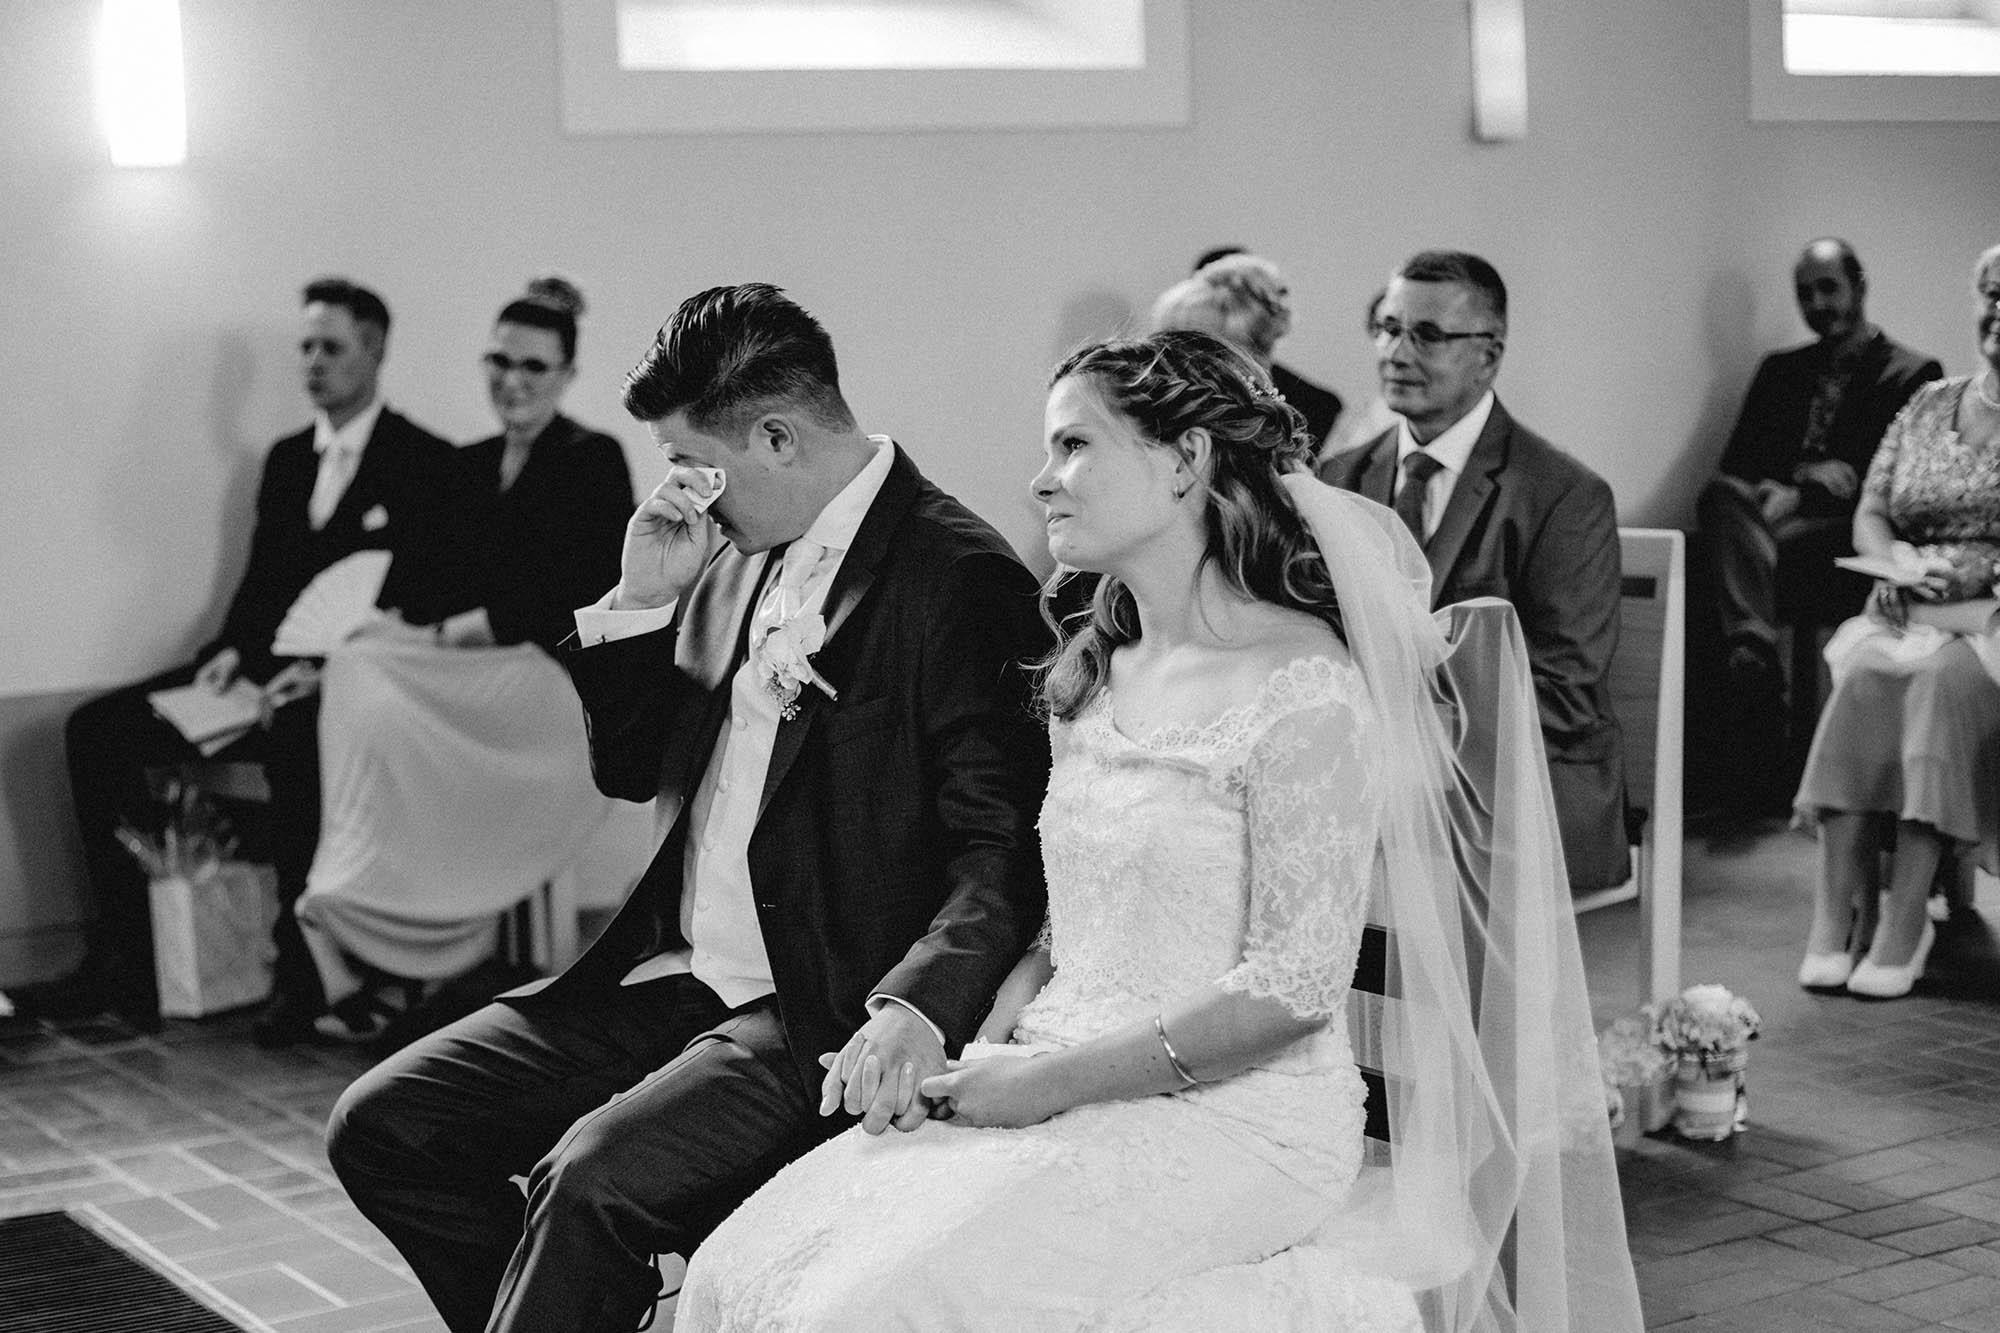 Virginia-Pech-Fotografie-Hochzeitsfotograf-Hochzeitsfotografie-Kulturscheune-Rangsdorf-Berlin-Anika-Nico-31